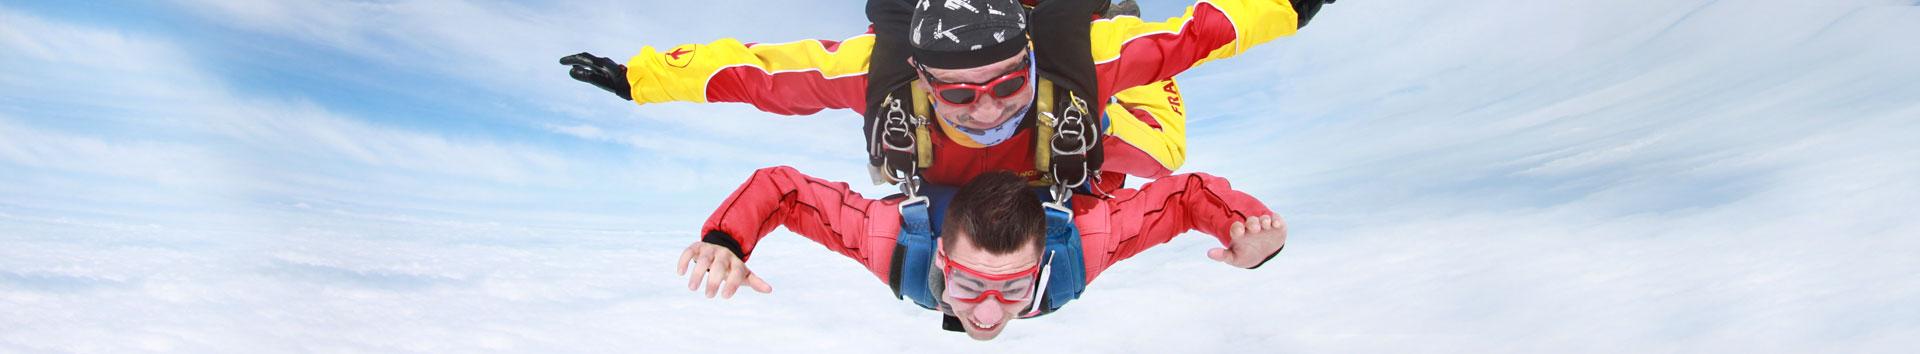 parachute springen vliegtuig